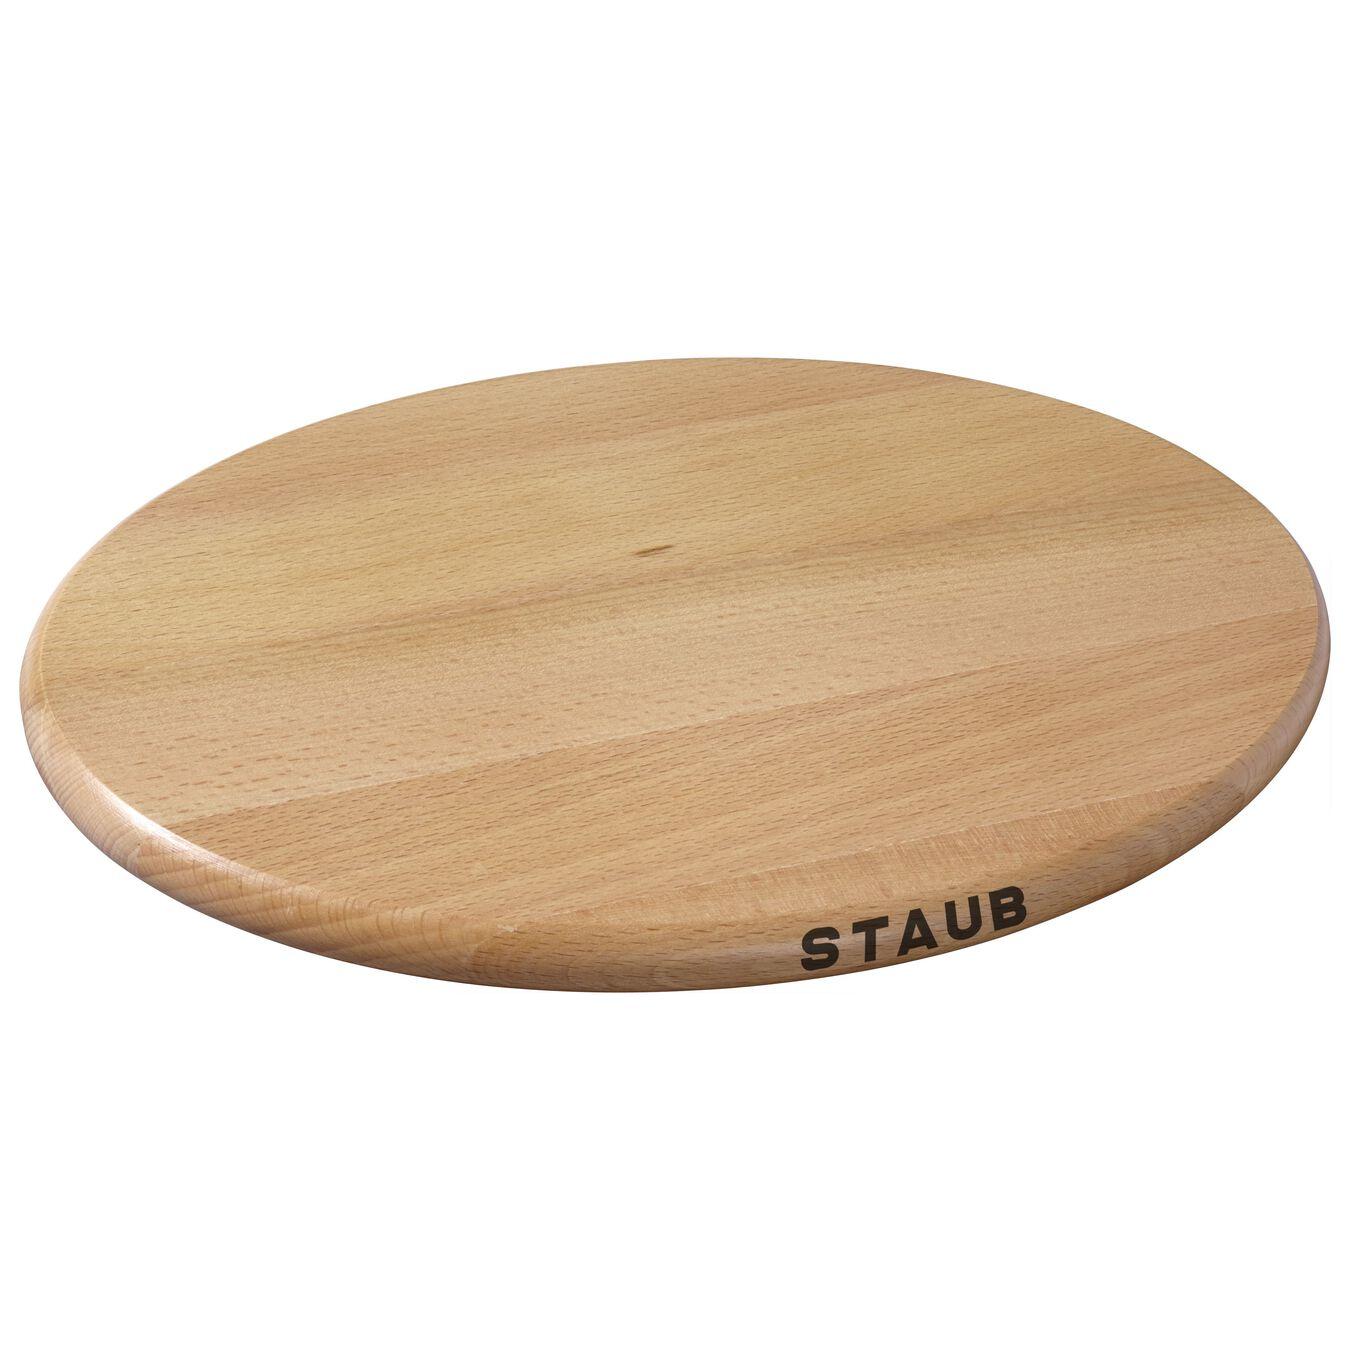 Descanso para panela magnetic 29 cm, oval, Faia,,large 1